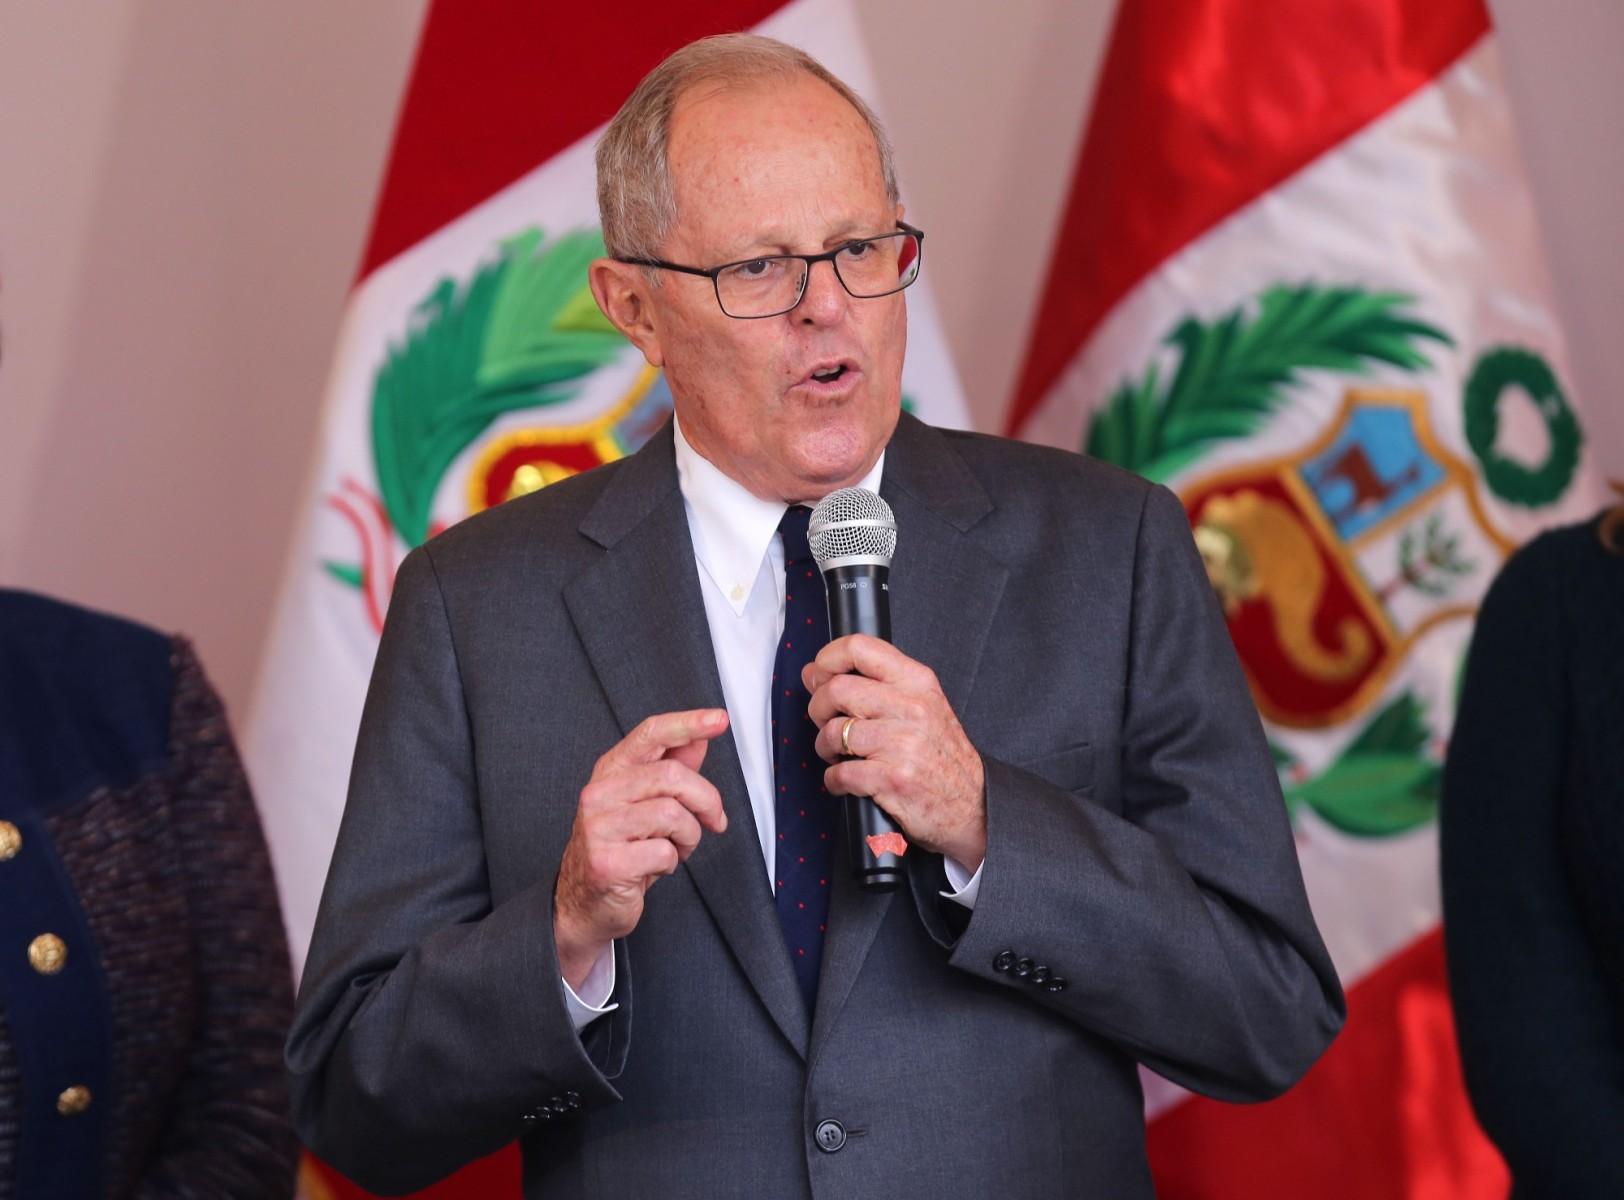 Kuczynski Perú